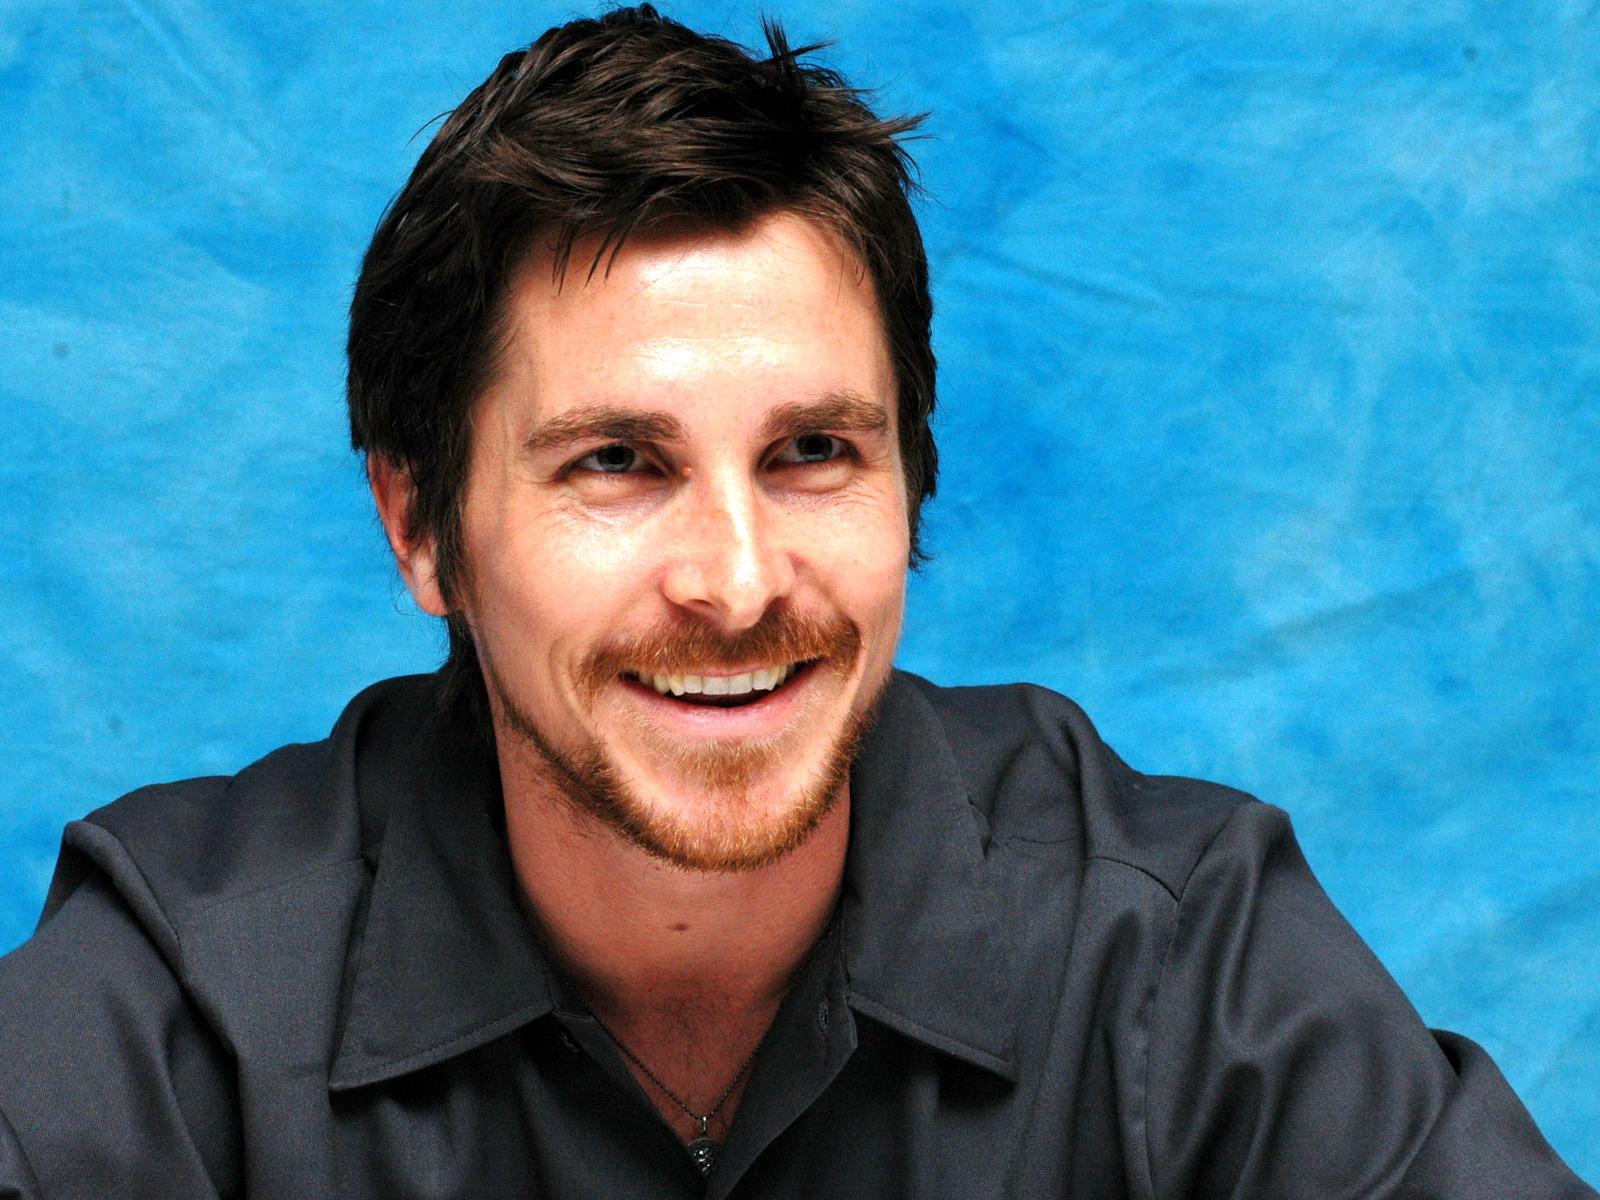 Christian Bale Backgrounds, Compatible - PC, Mobile, Gadgets| 1600x1200 px